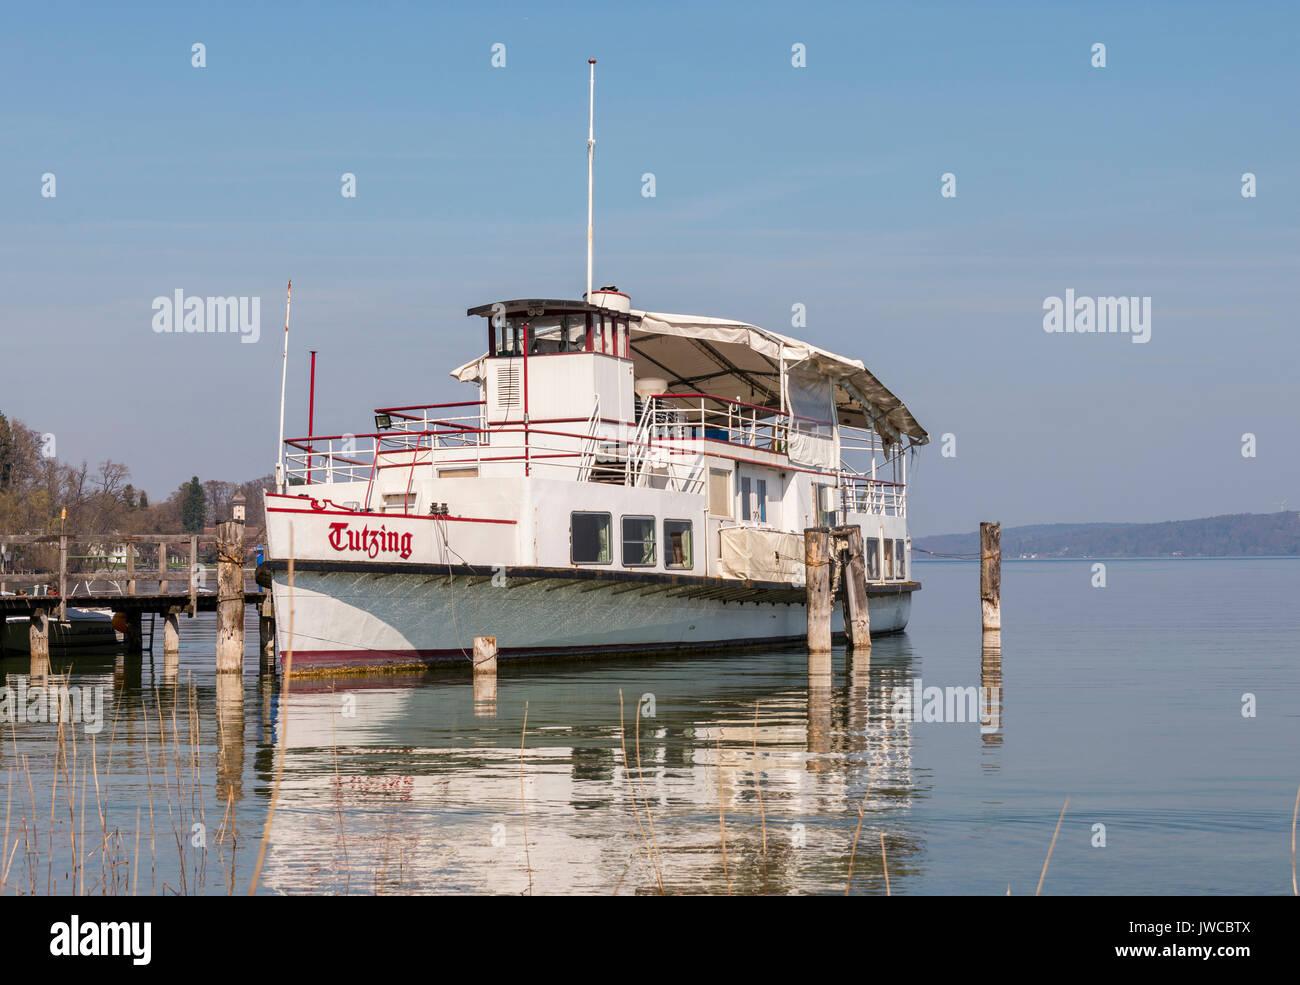 Passenger ship Tutzing at a jetty, European Starnberger See, Upper Bavaria, Bavaria, Germany - Stock Image